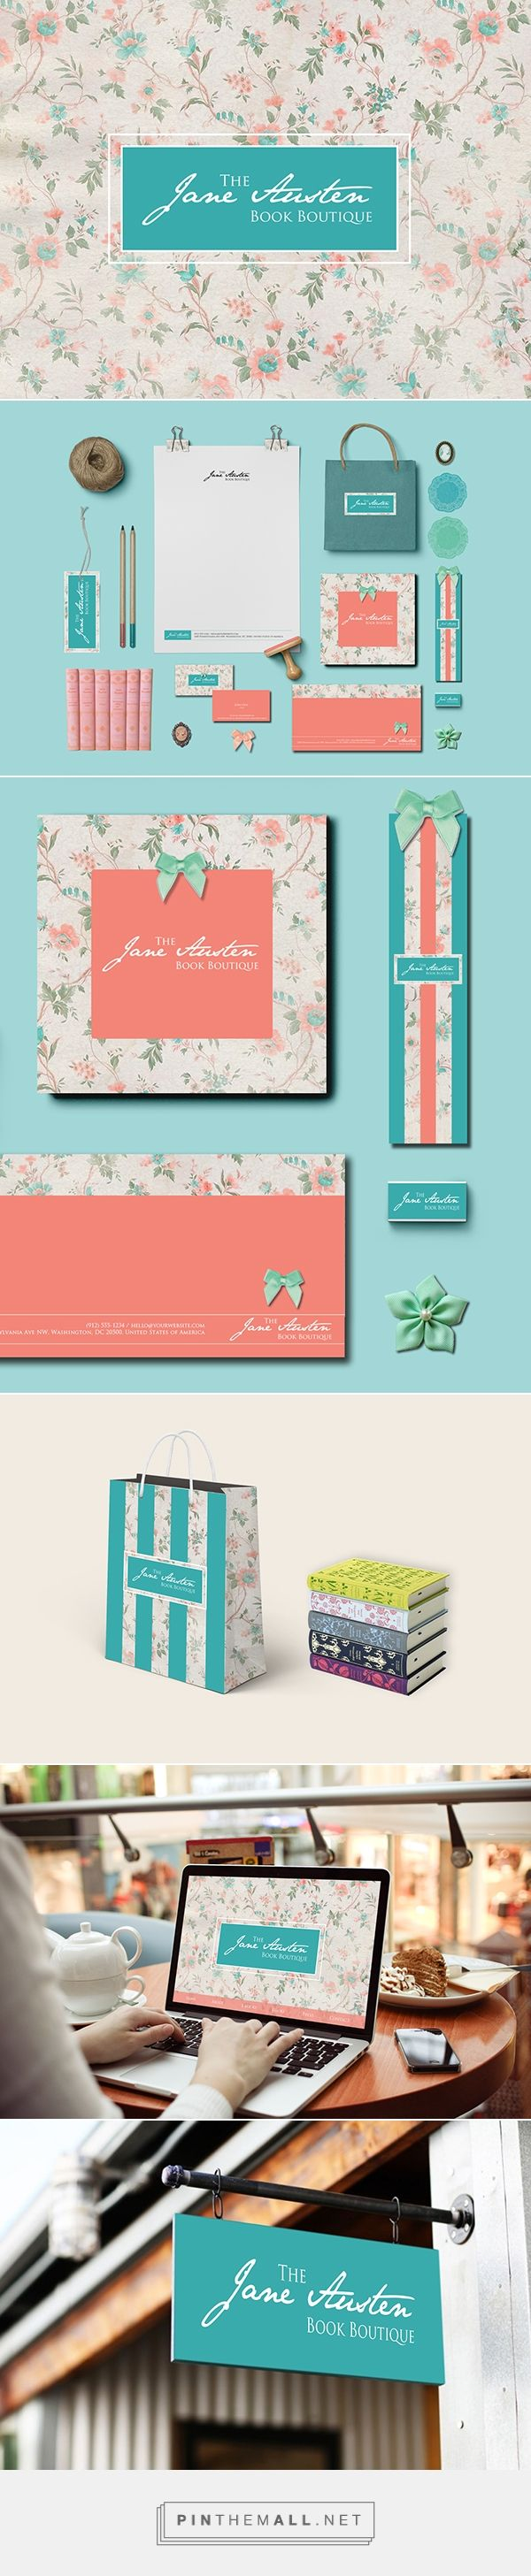 The Jane Austen Book Boutique on Behance | Fivestar Branding – Design and Branding Agency & Inspiration Gallery